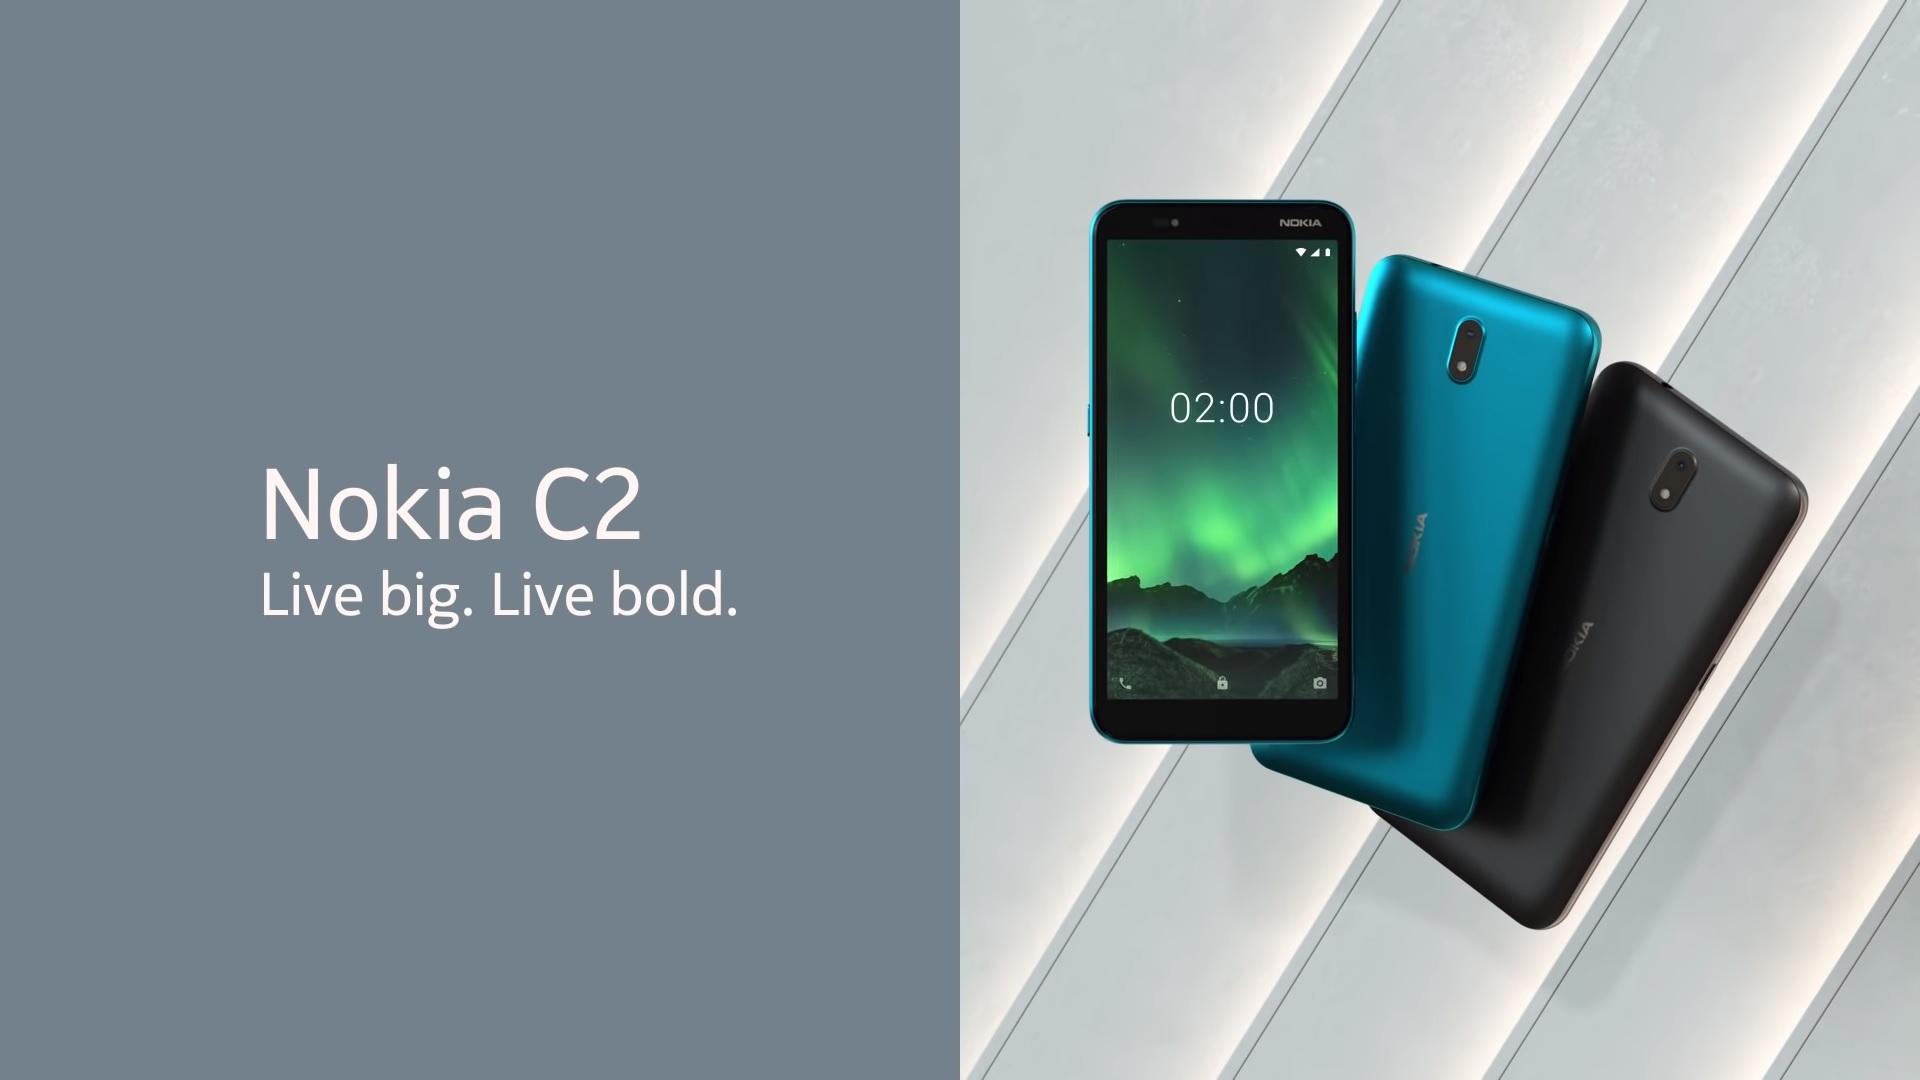 Nokia C2 smartphone